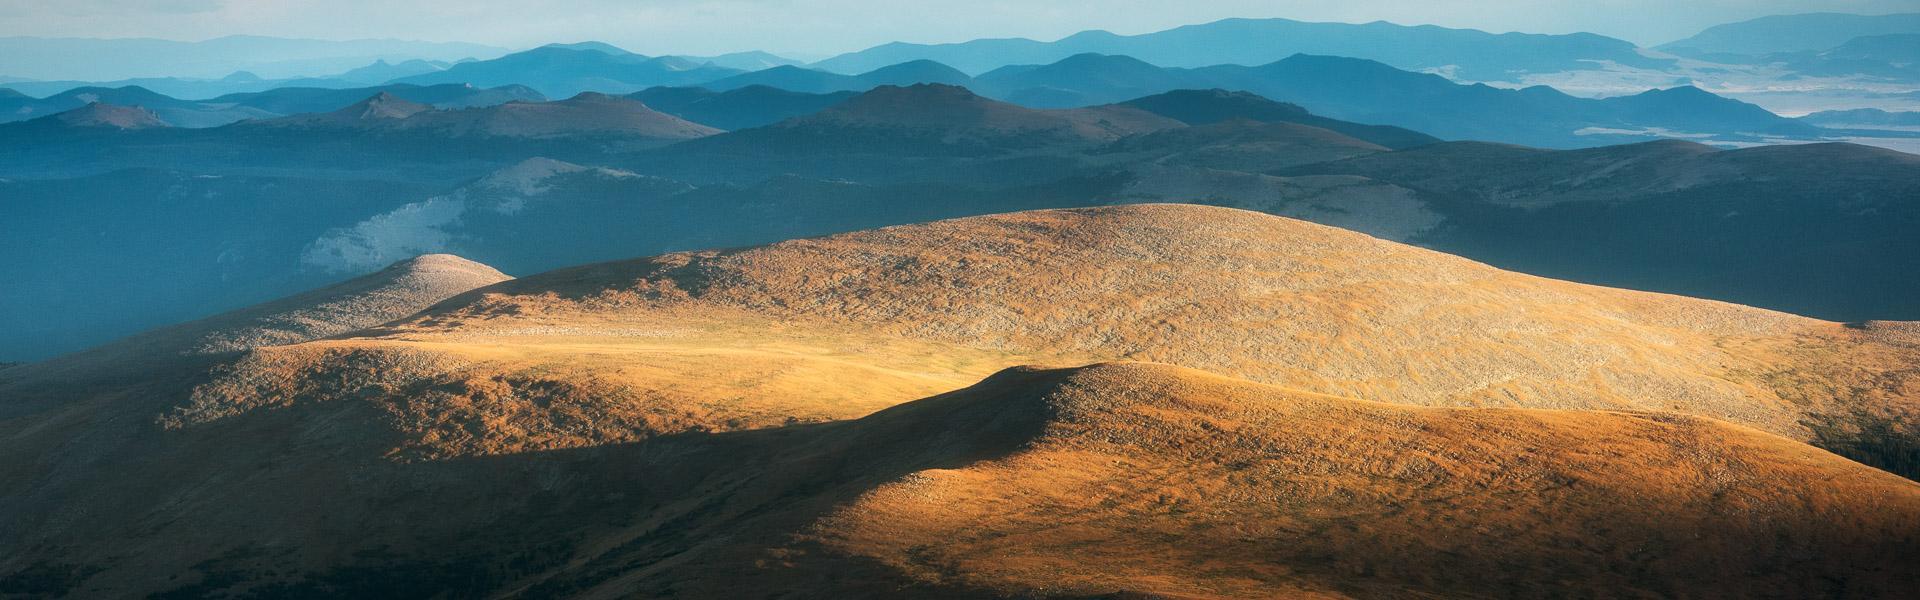 Big Sun Photography Denver Colorado Gene Tewksbury